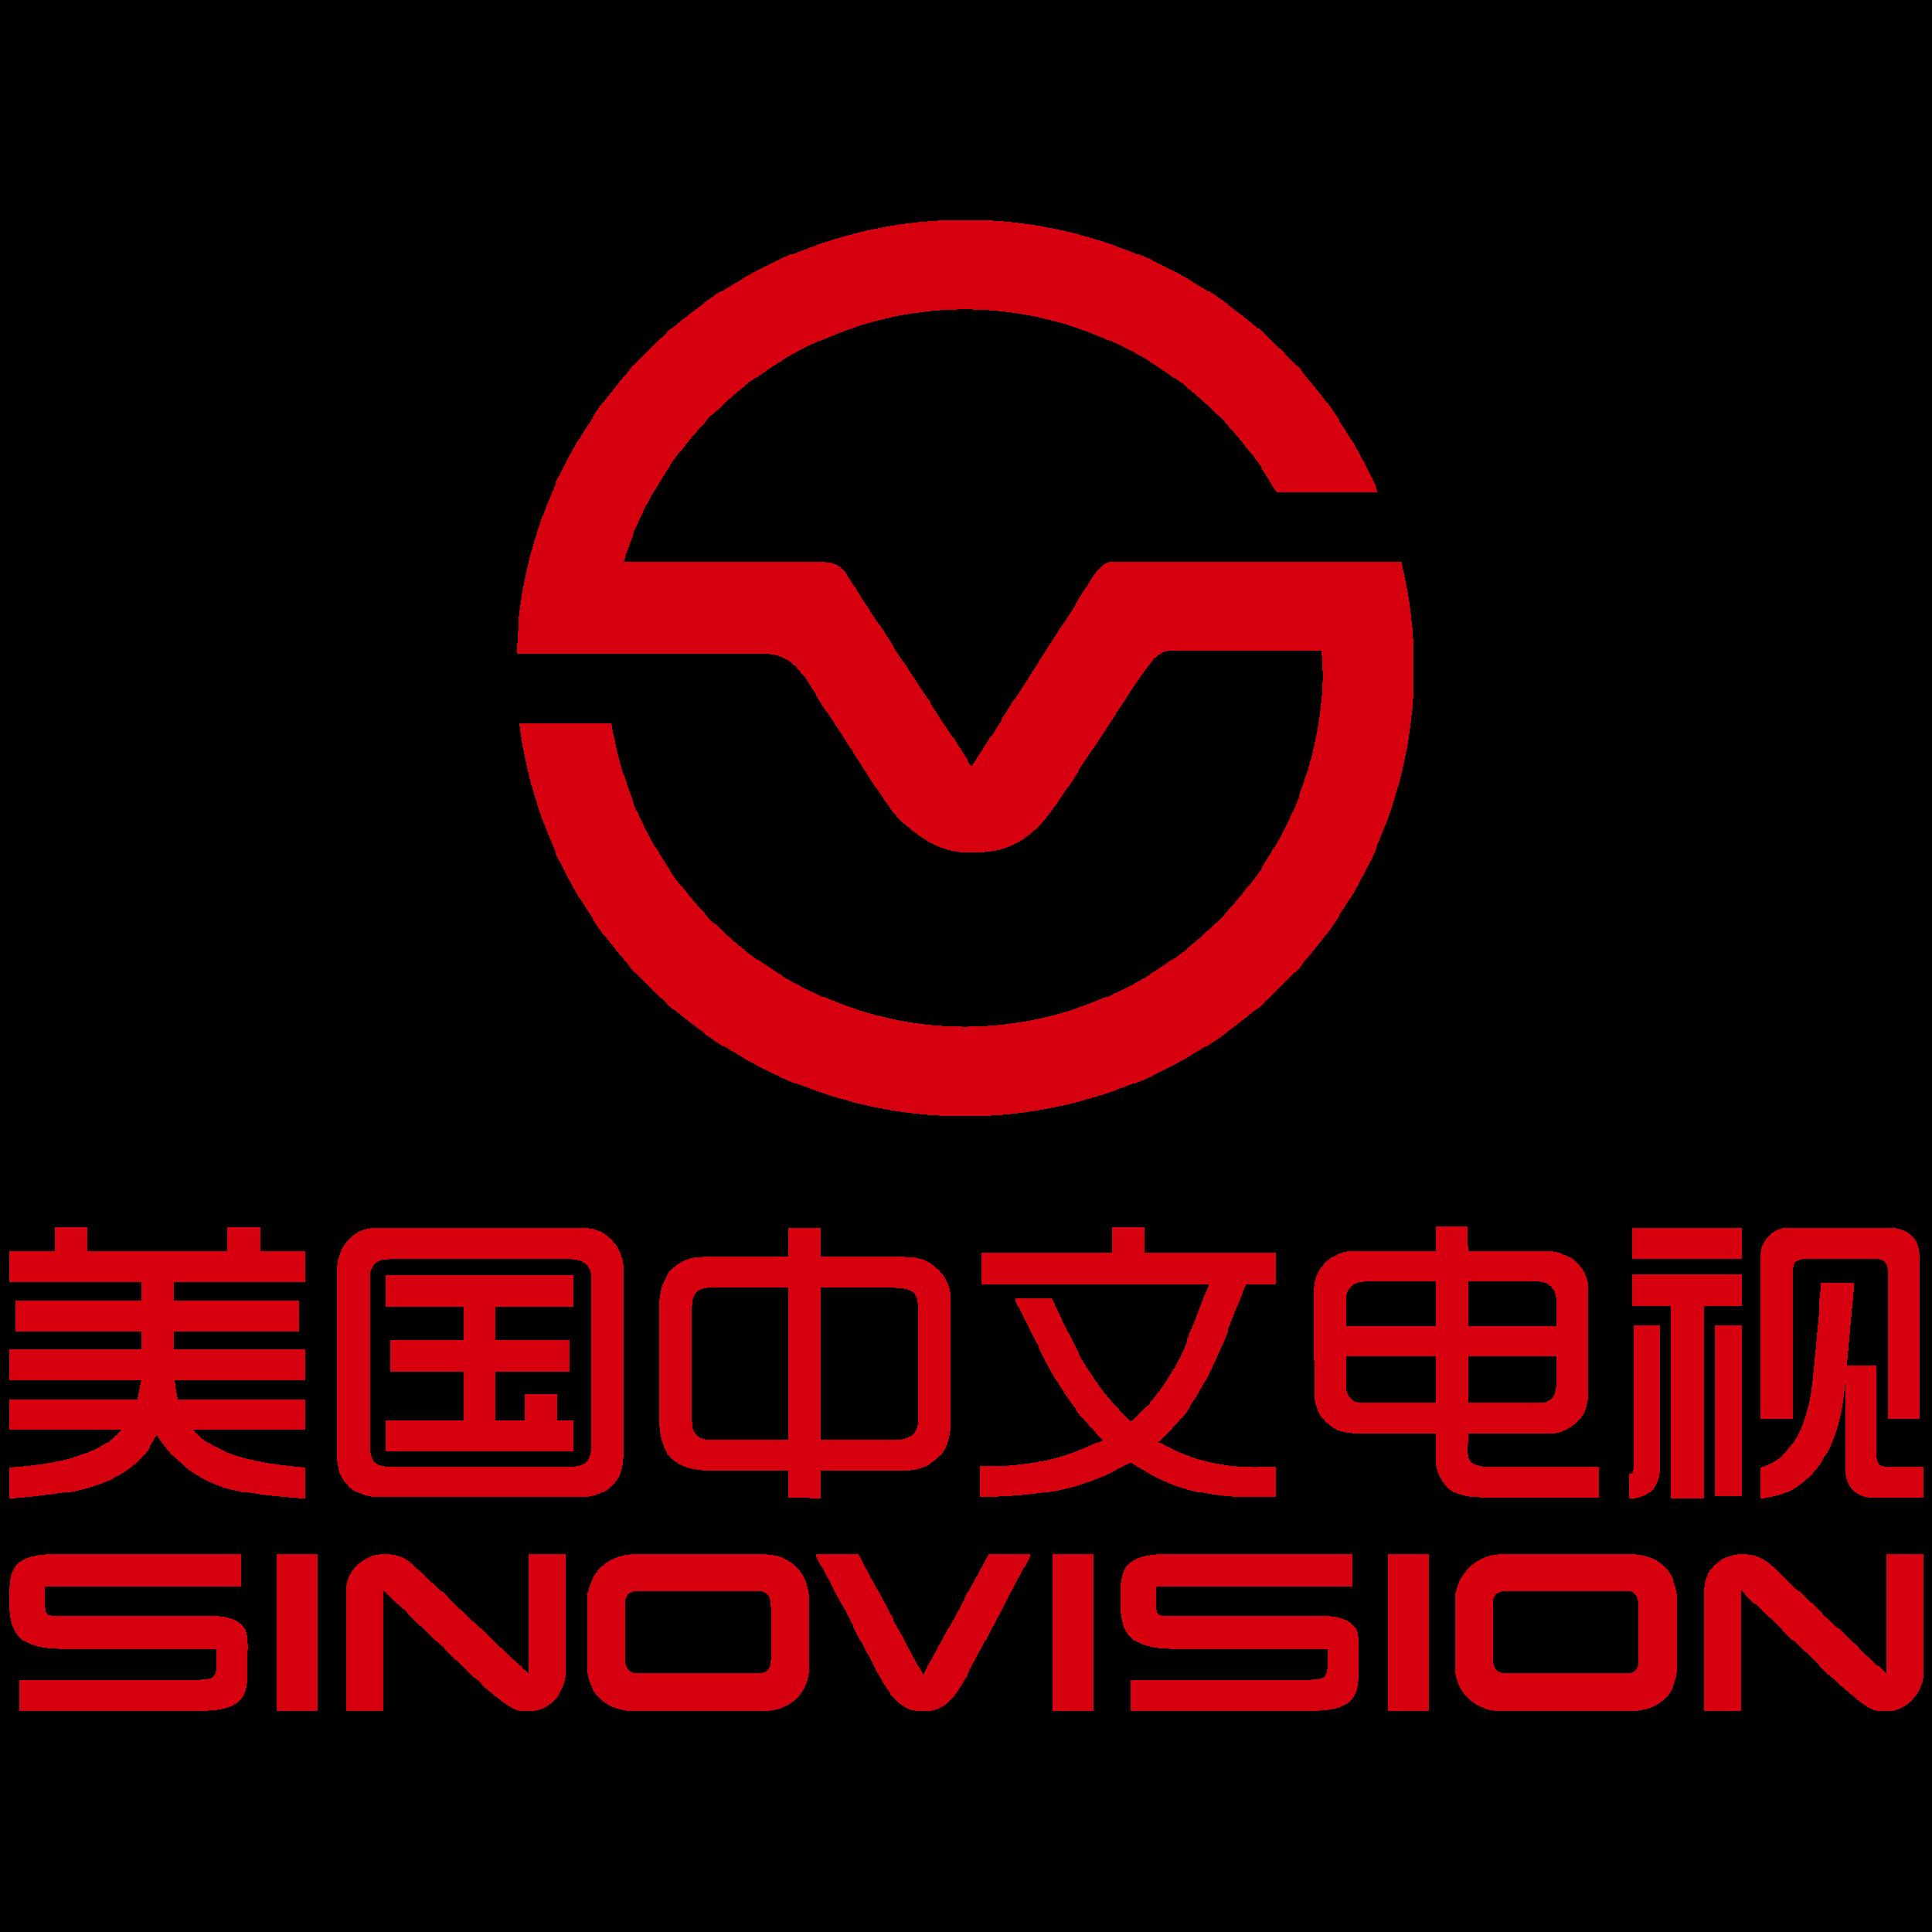 SV_logo1 copy.png